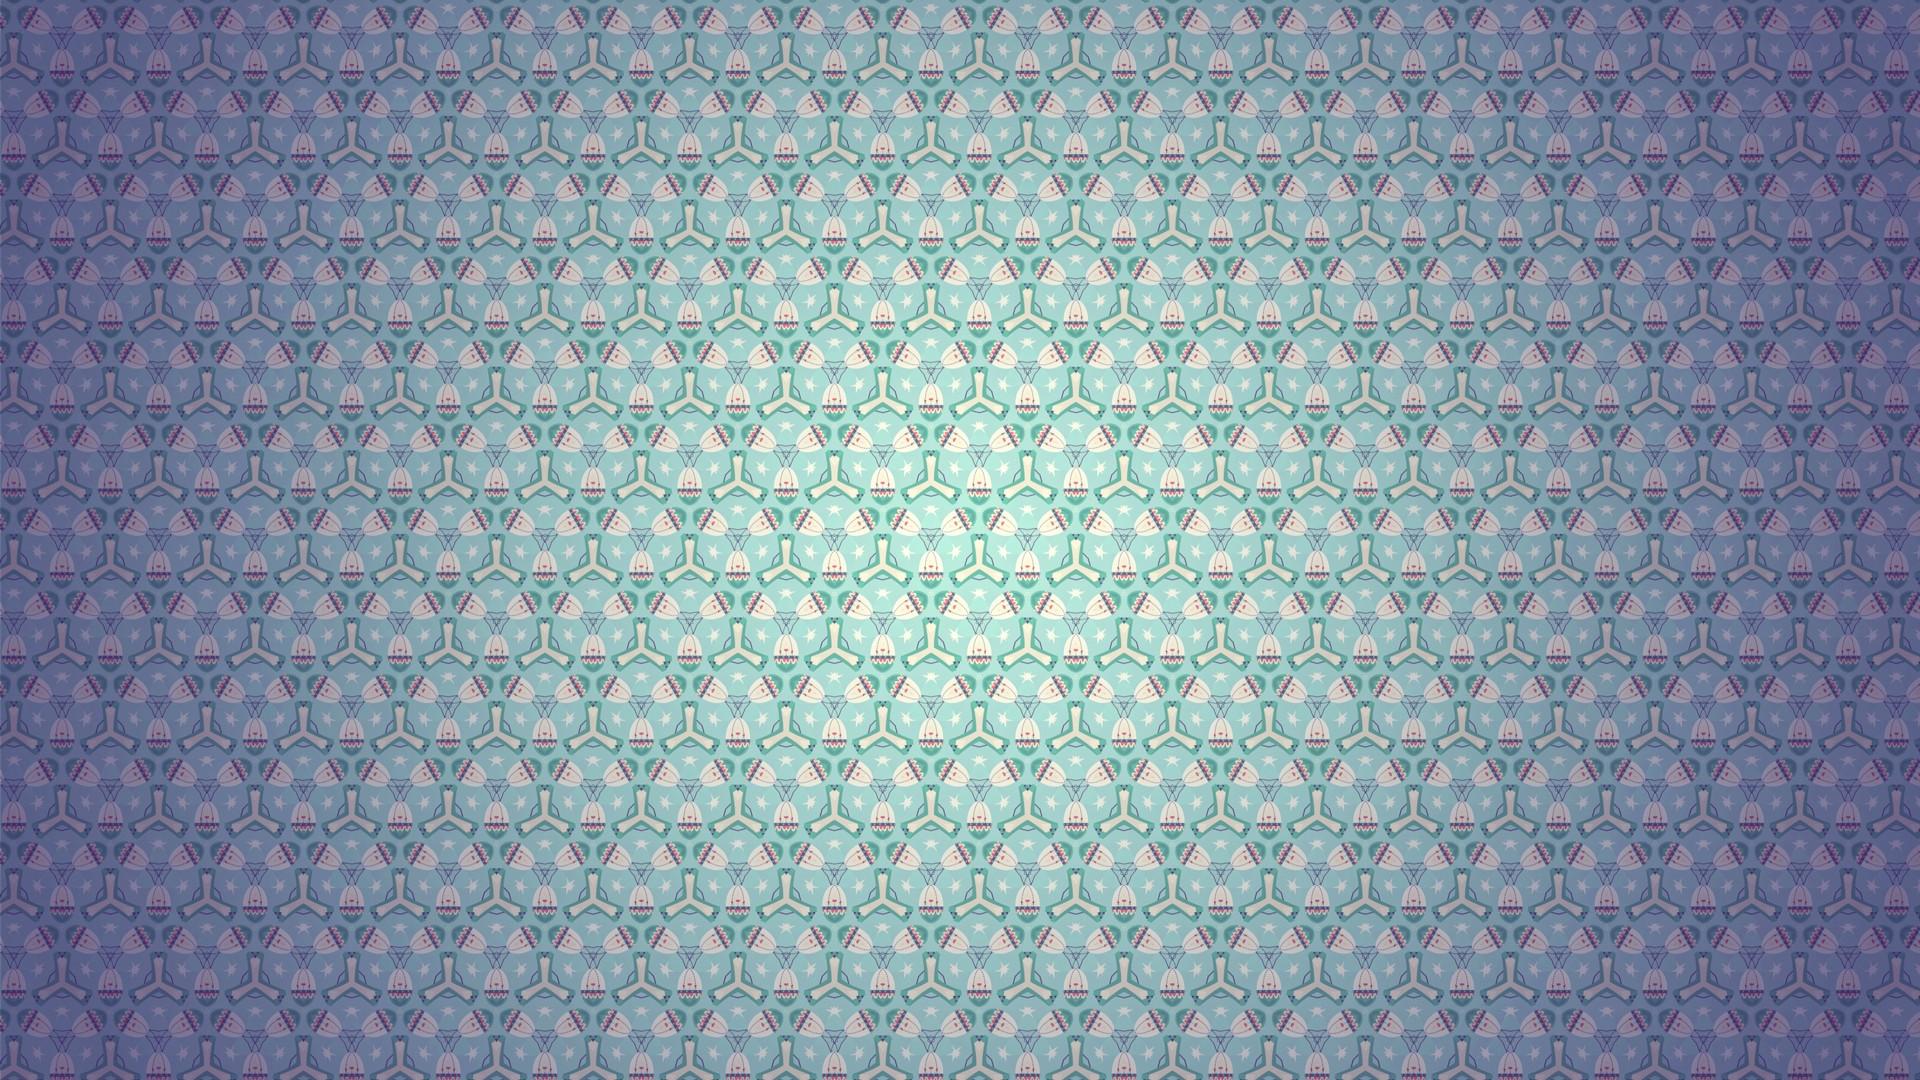 Christmas Pattern 1920x1080 (1080p) - Wallpaper